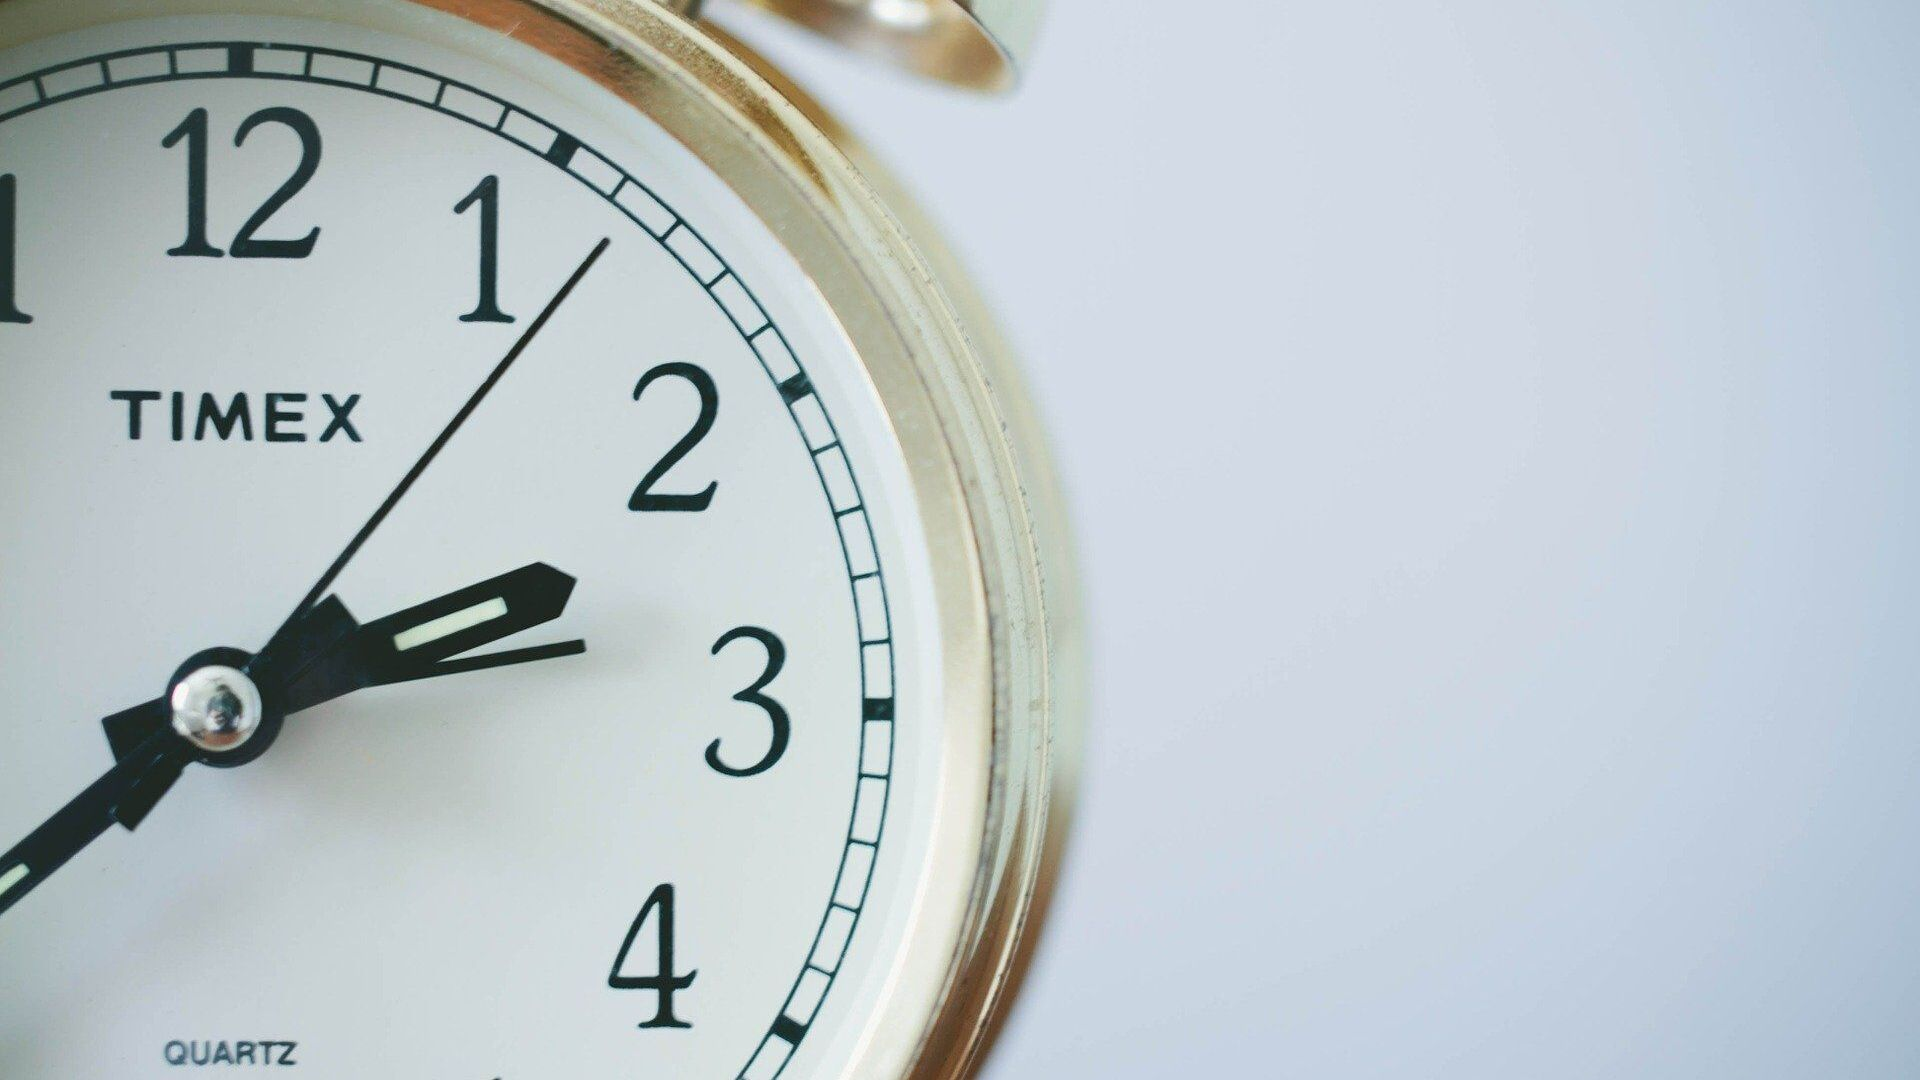 Un reloj, referencial - Sputnik Mundo, 1920, 29.03.2021